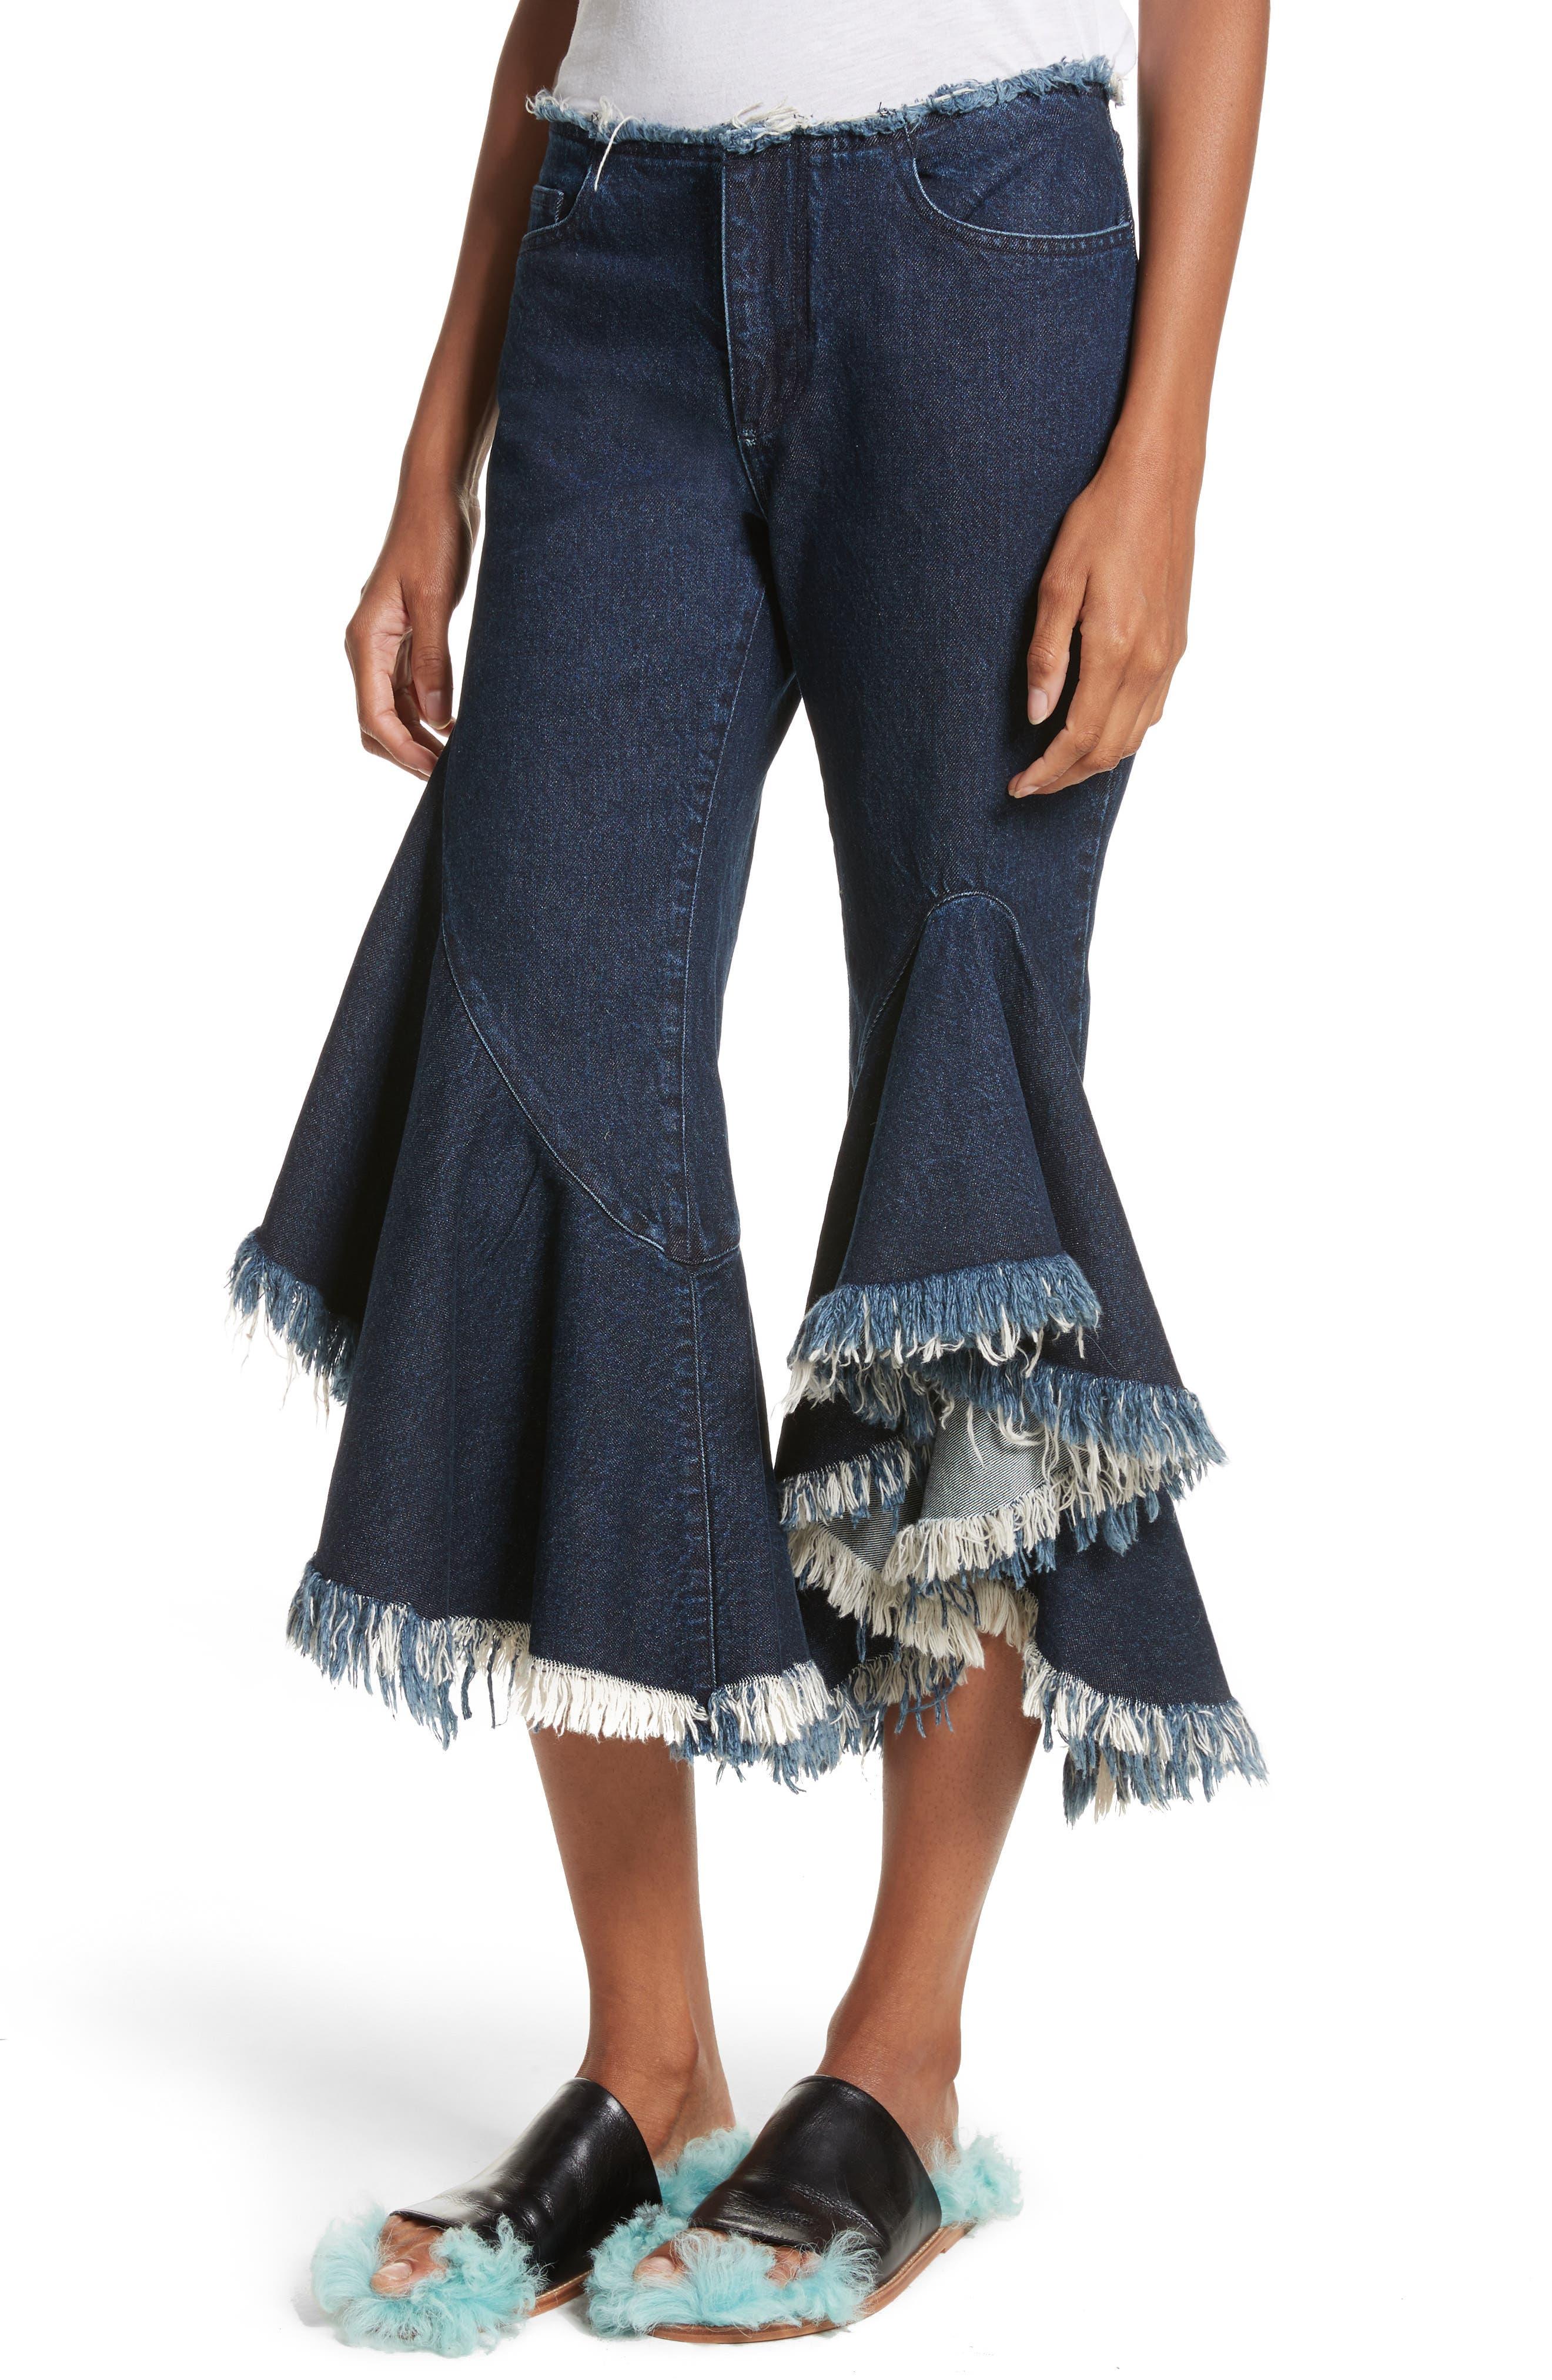 Marques'Almeida Frill Flare Crop Jeans,                             Alternate thumbnail 6, color,                             Indigo